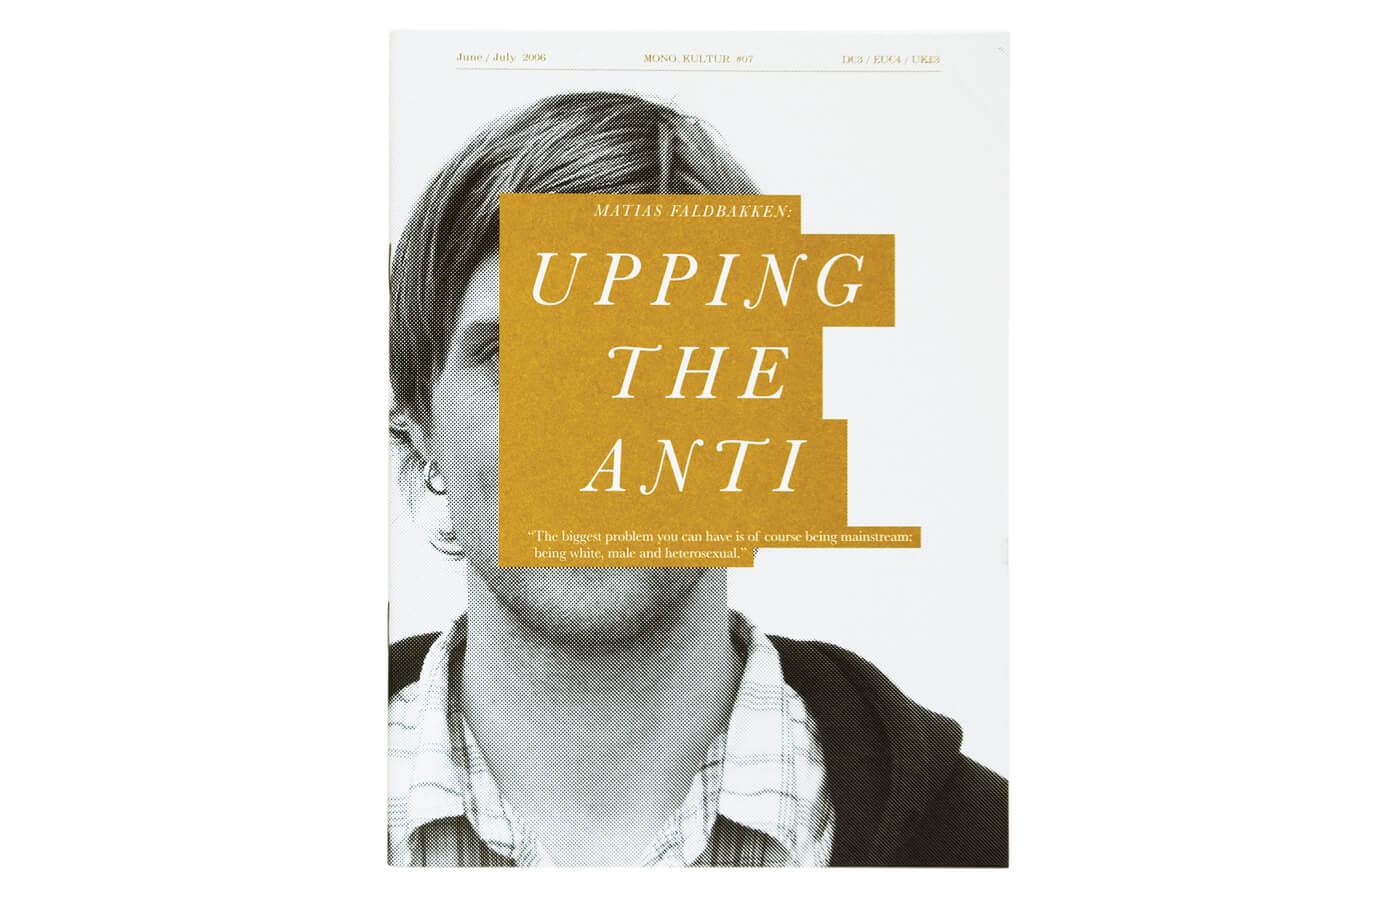 mono.kultur #07, Matias Faldbakken: Upping The Anti